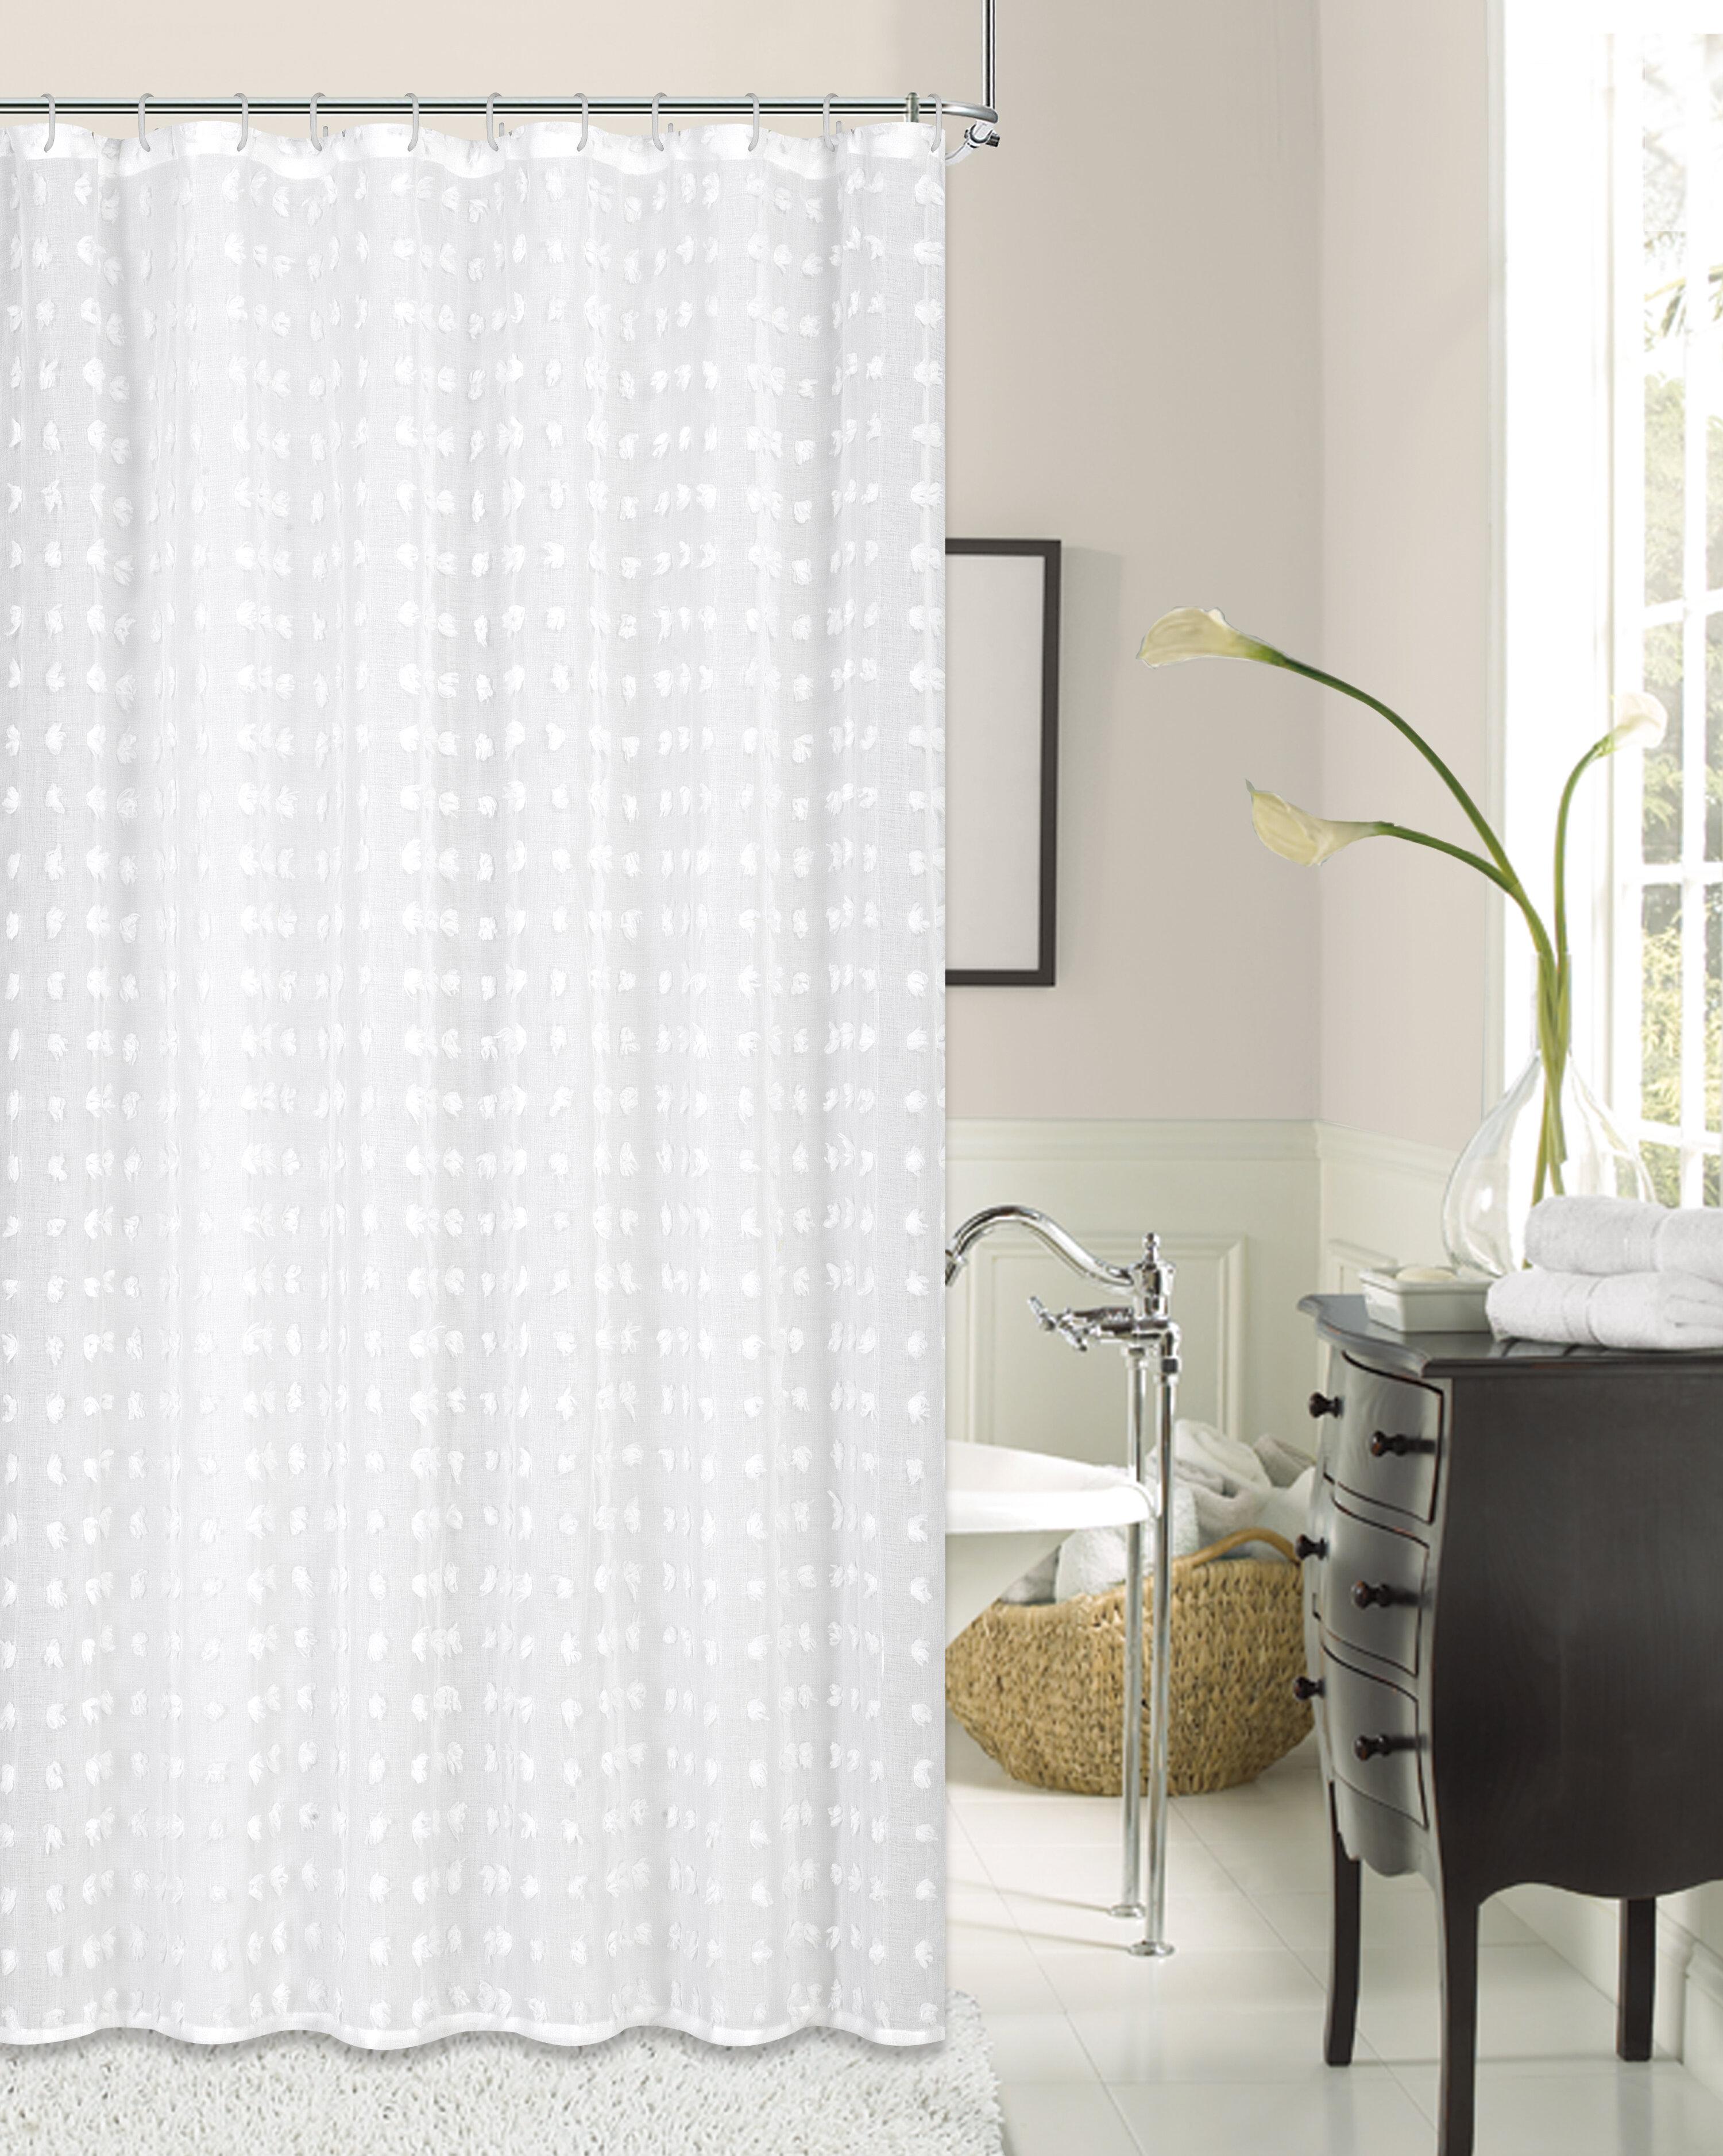 Marshallville Cut Flower Linen Look Fabric Single Shower Curtain